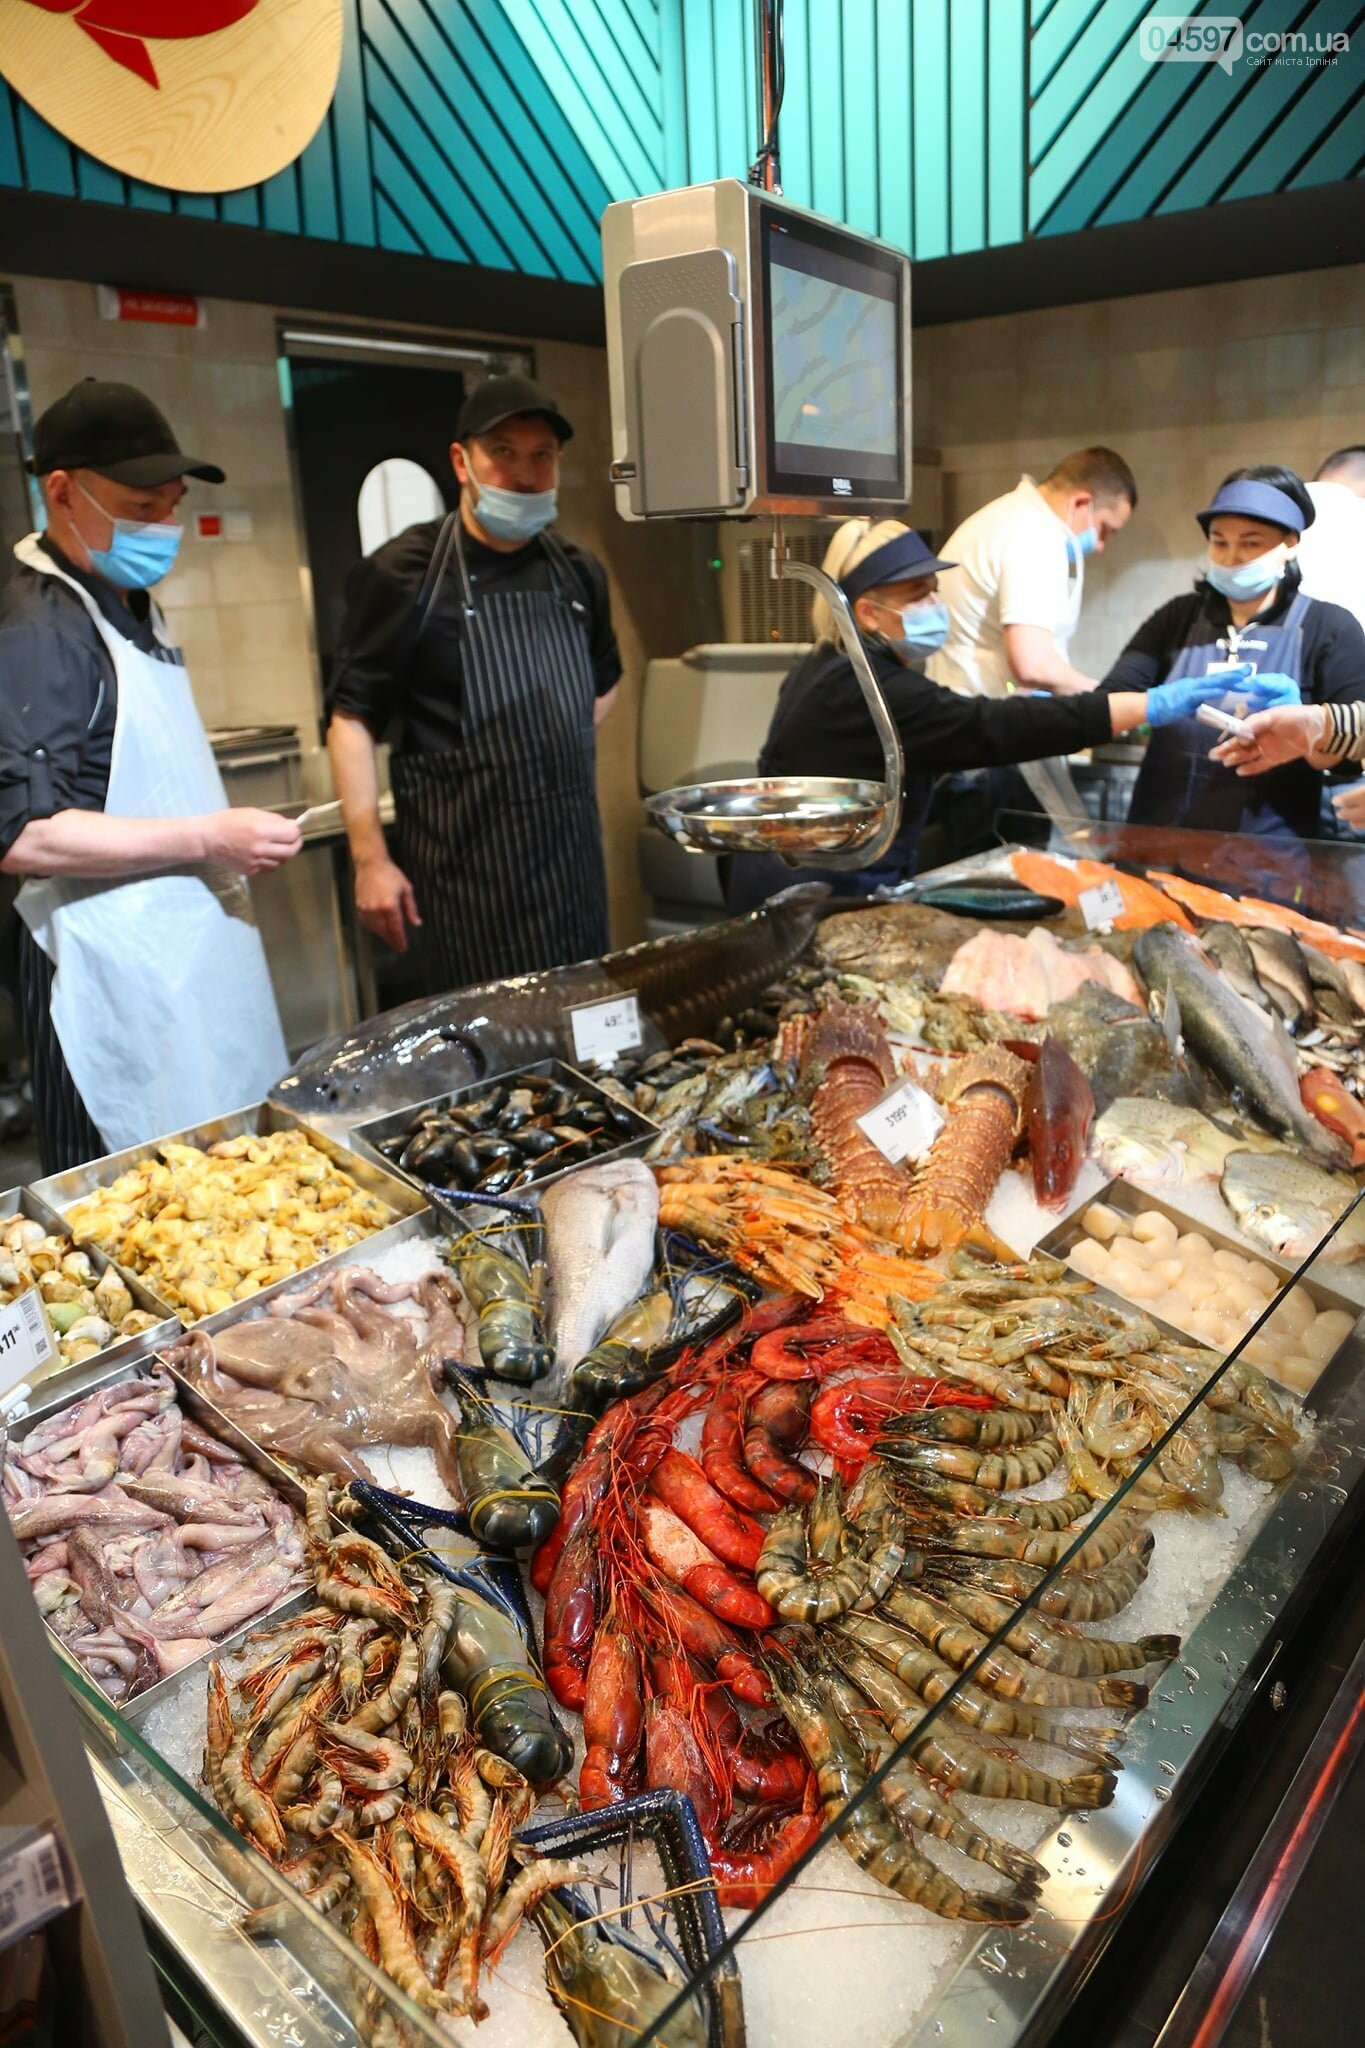 Food Market в Епіцентрі. Фото rau.ua